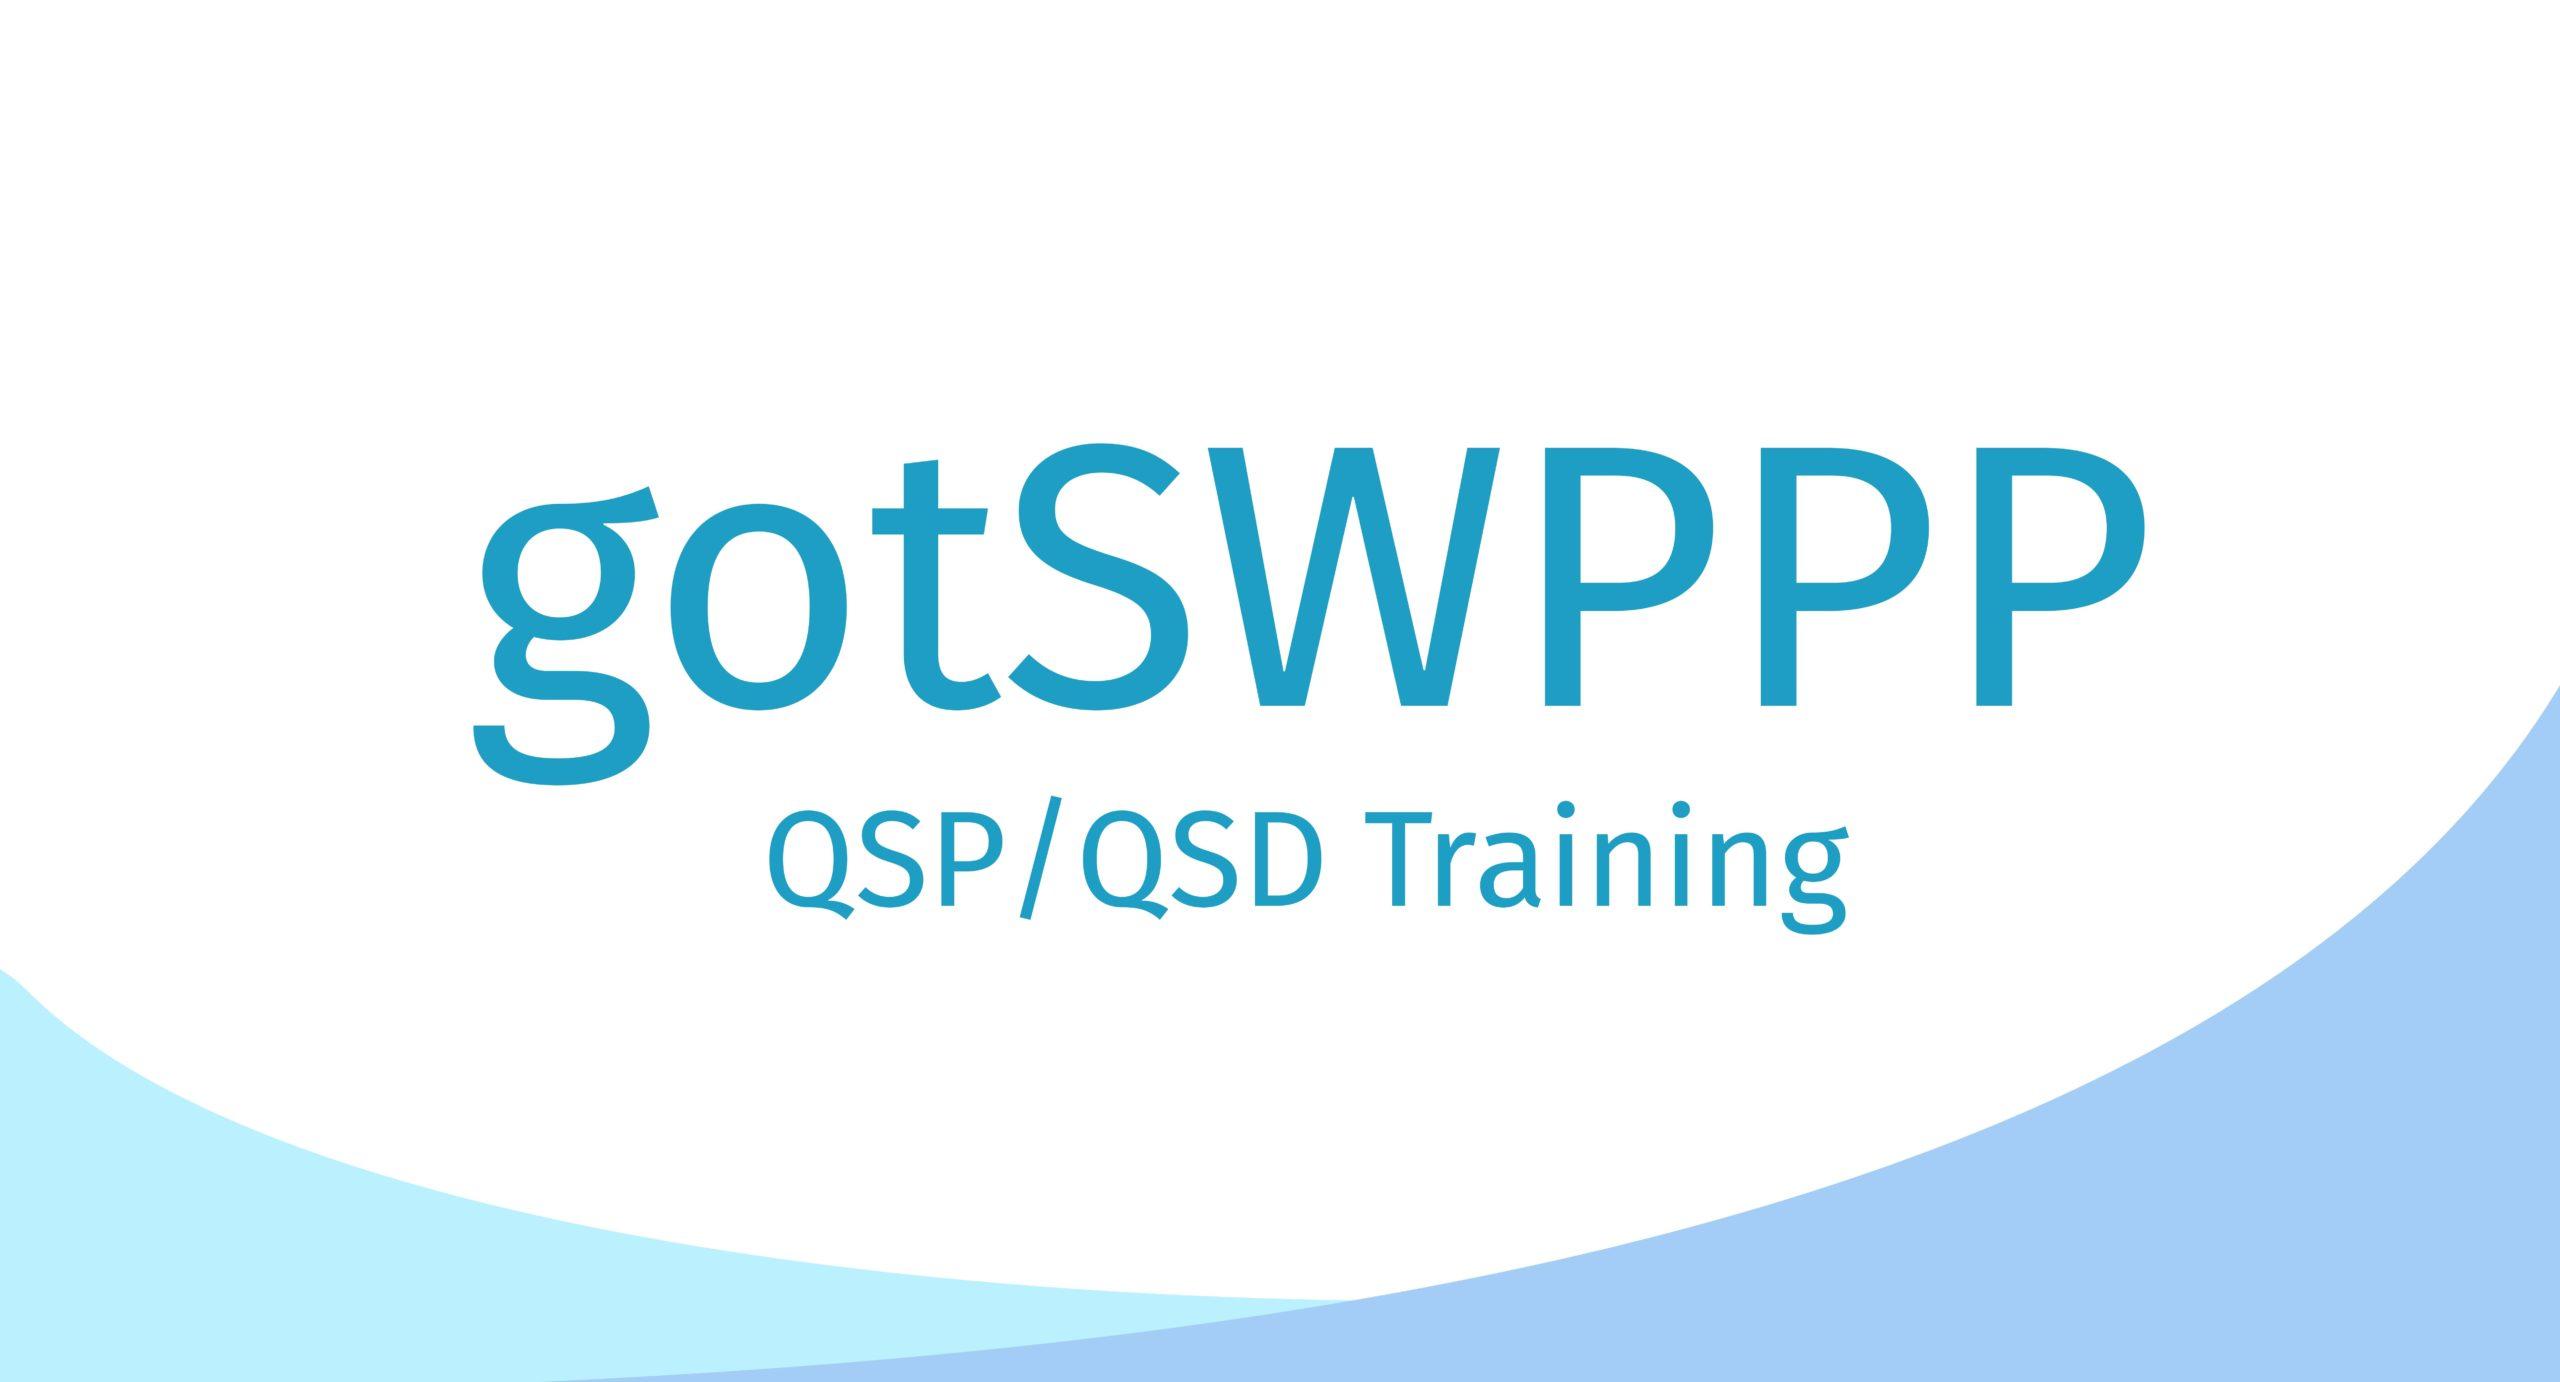 QSP/QSD Certification Course – October 15-17, 2019